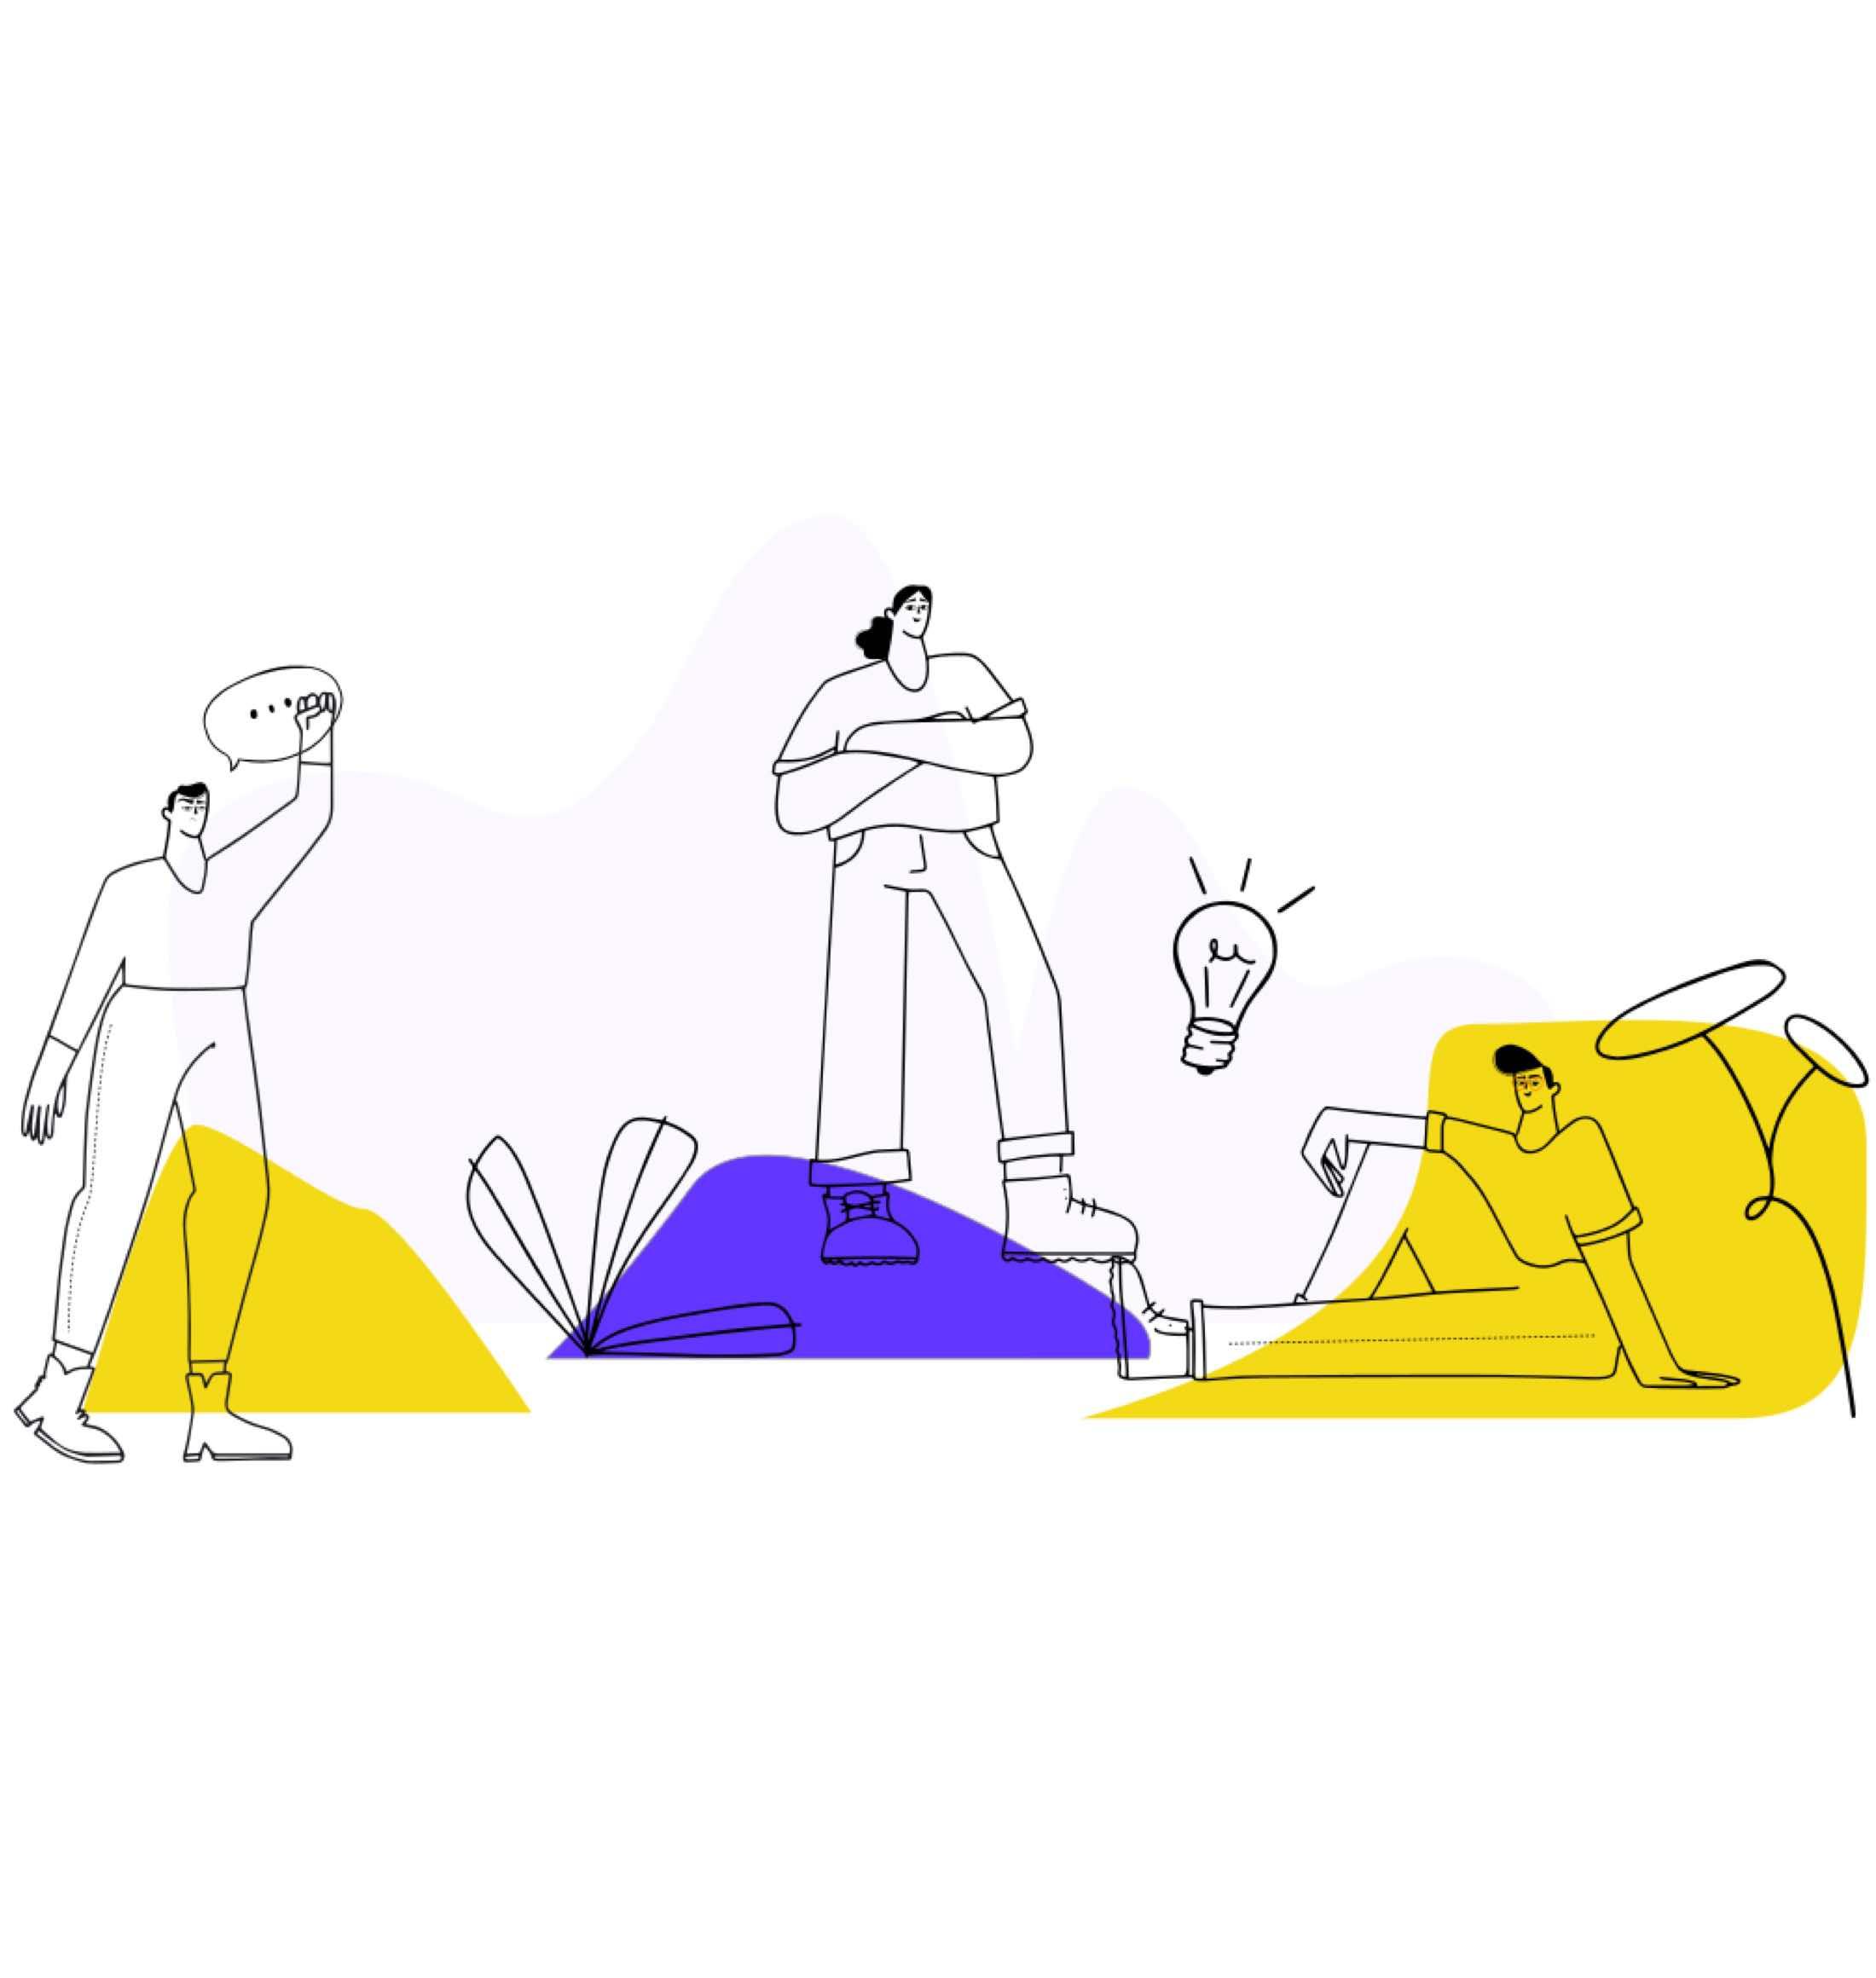 Illustration of three figures lounging